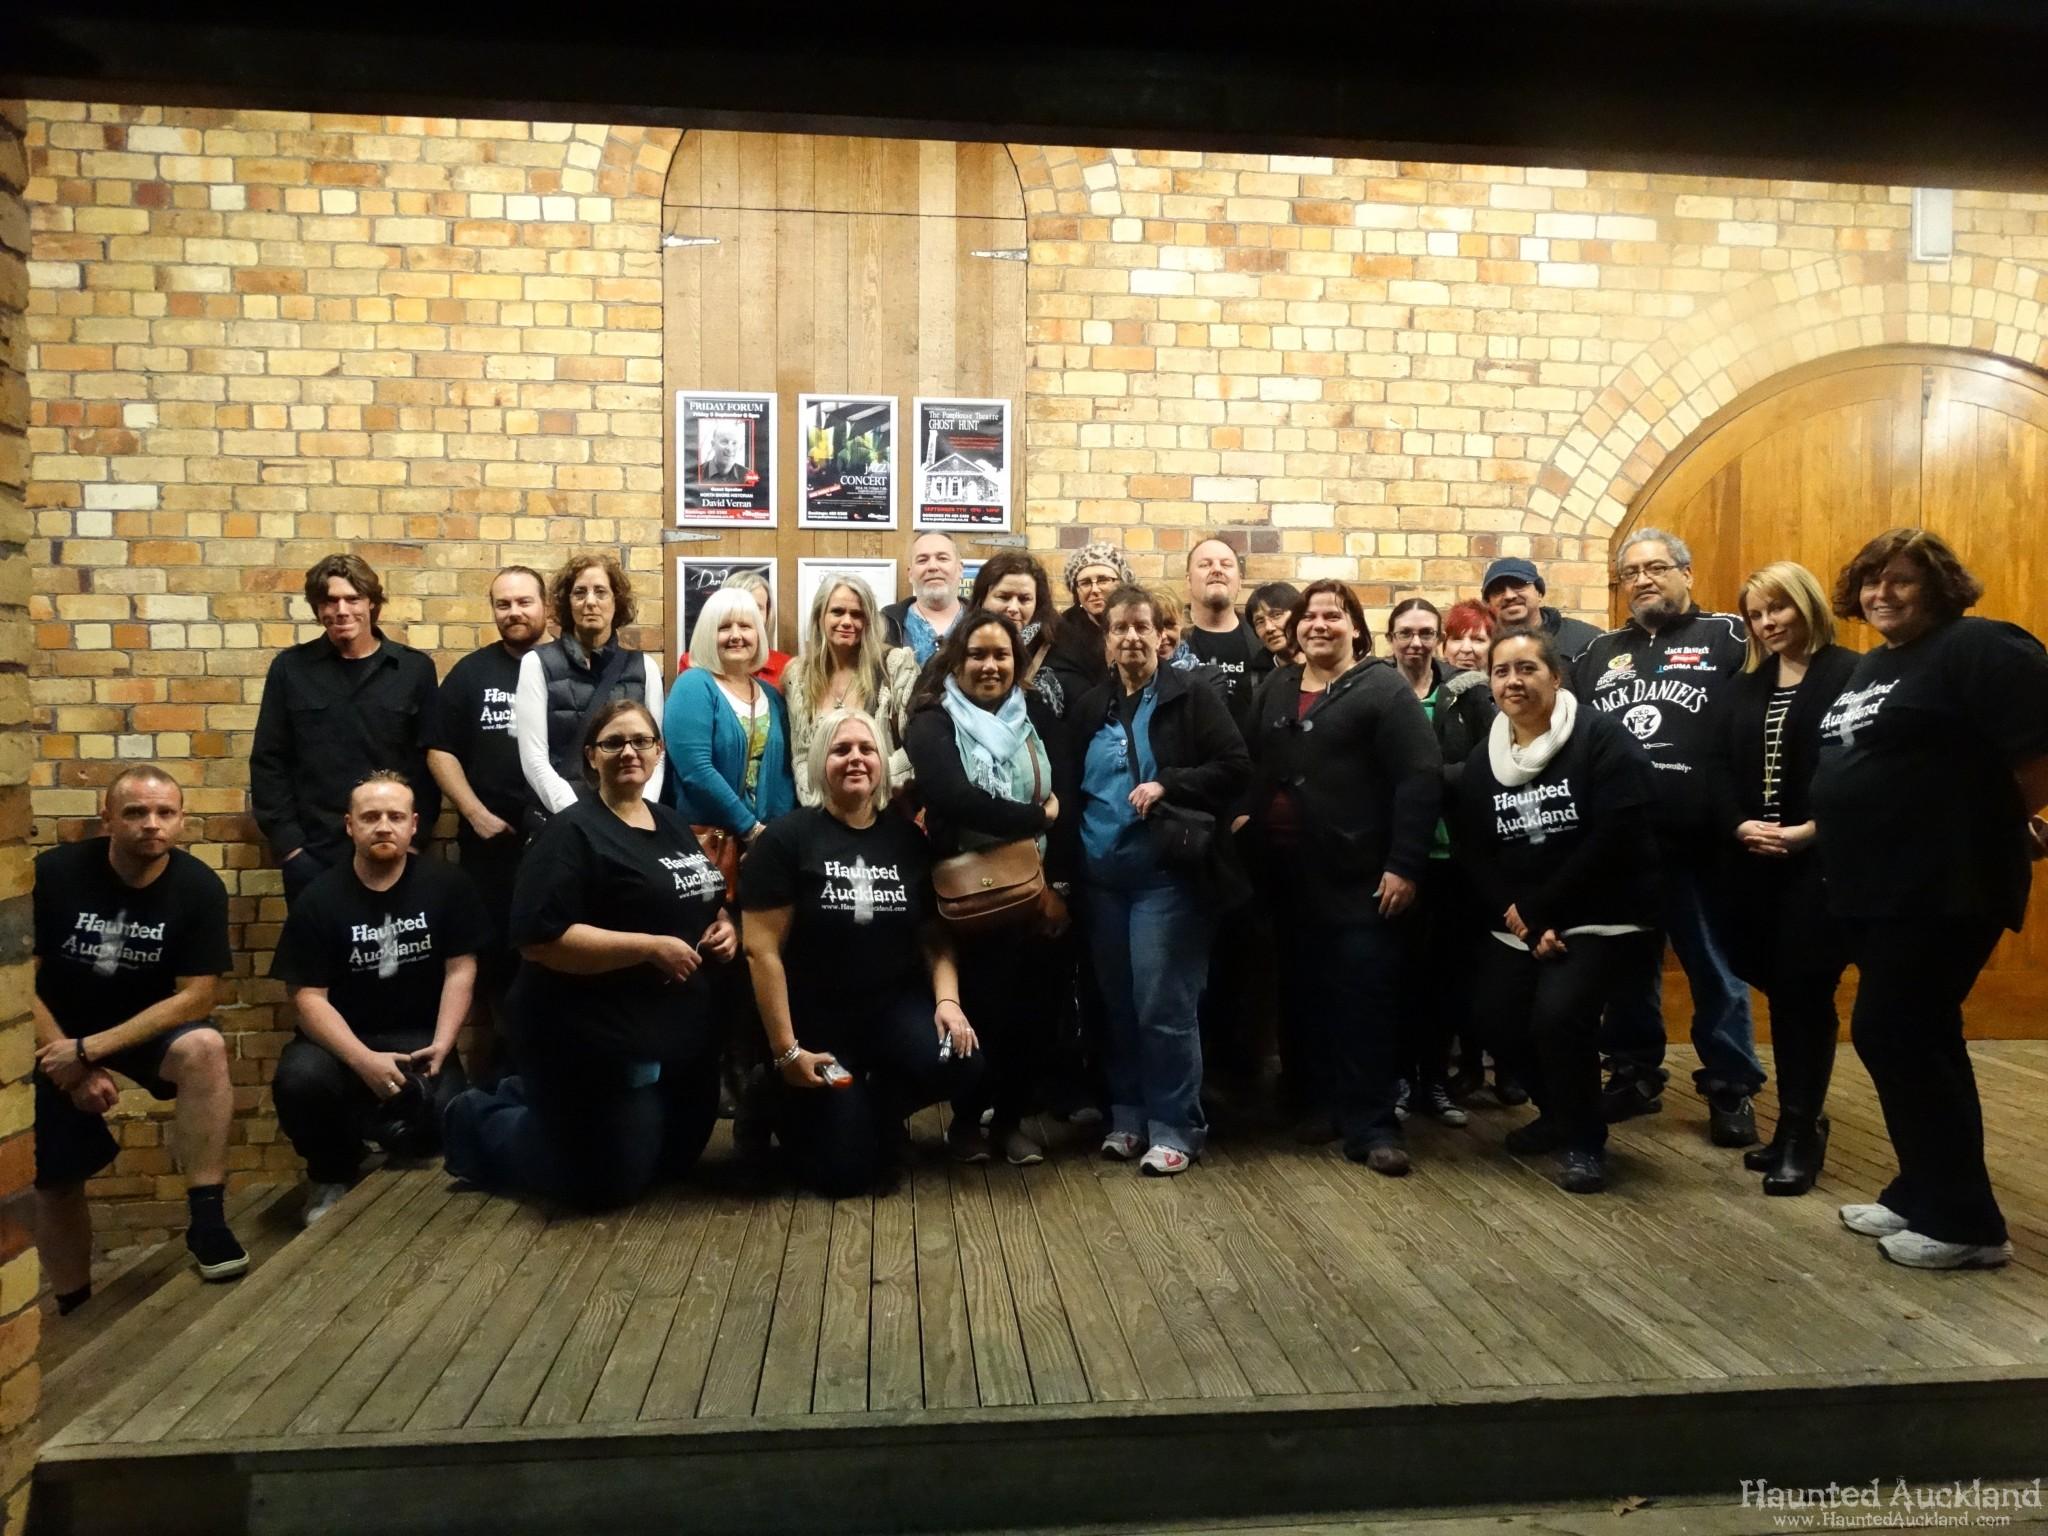 PUBLIC GHOST HUNT: The Pumphouse Theatre – Sept 7th 2014